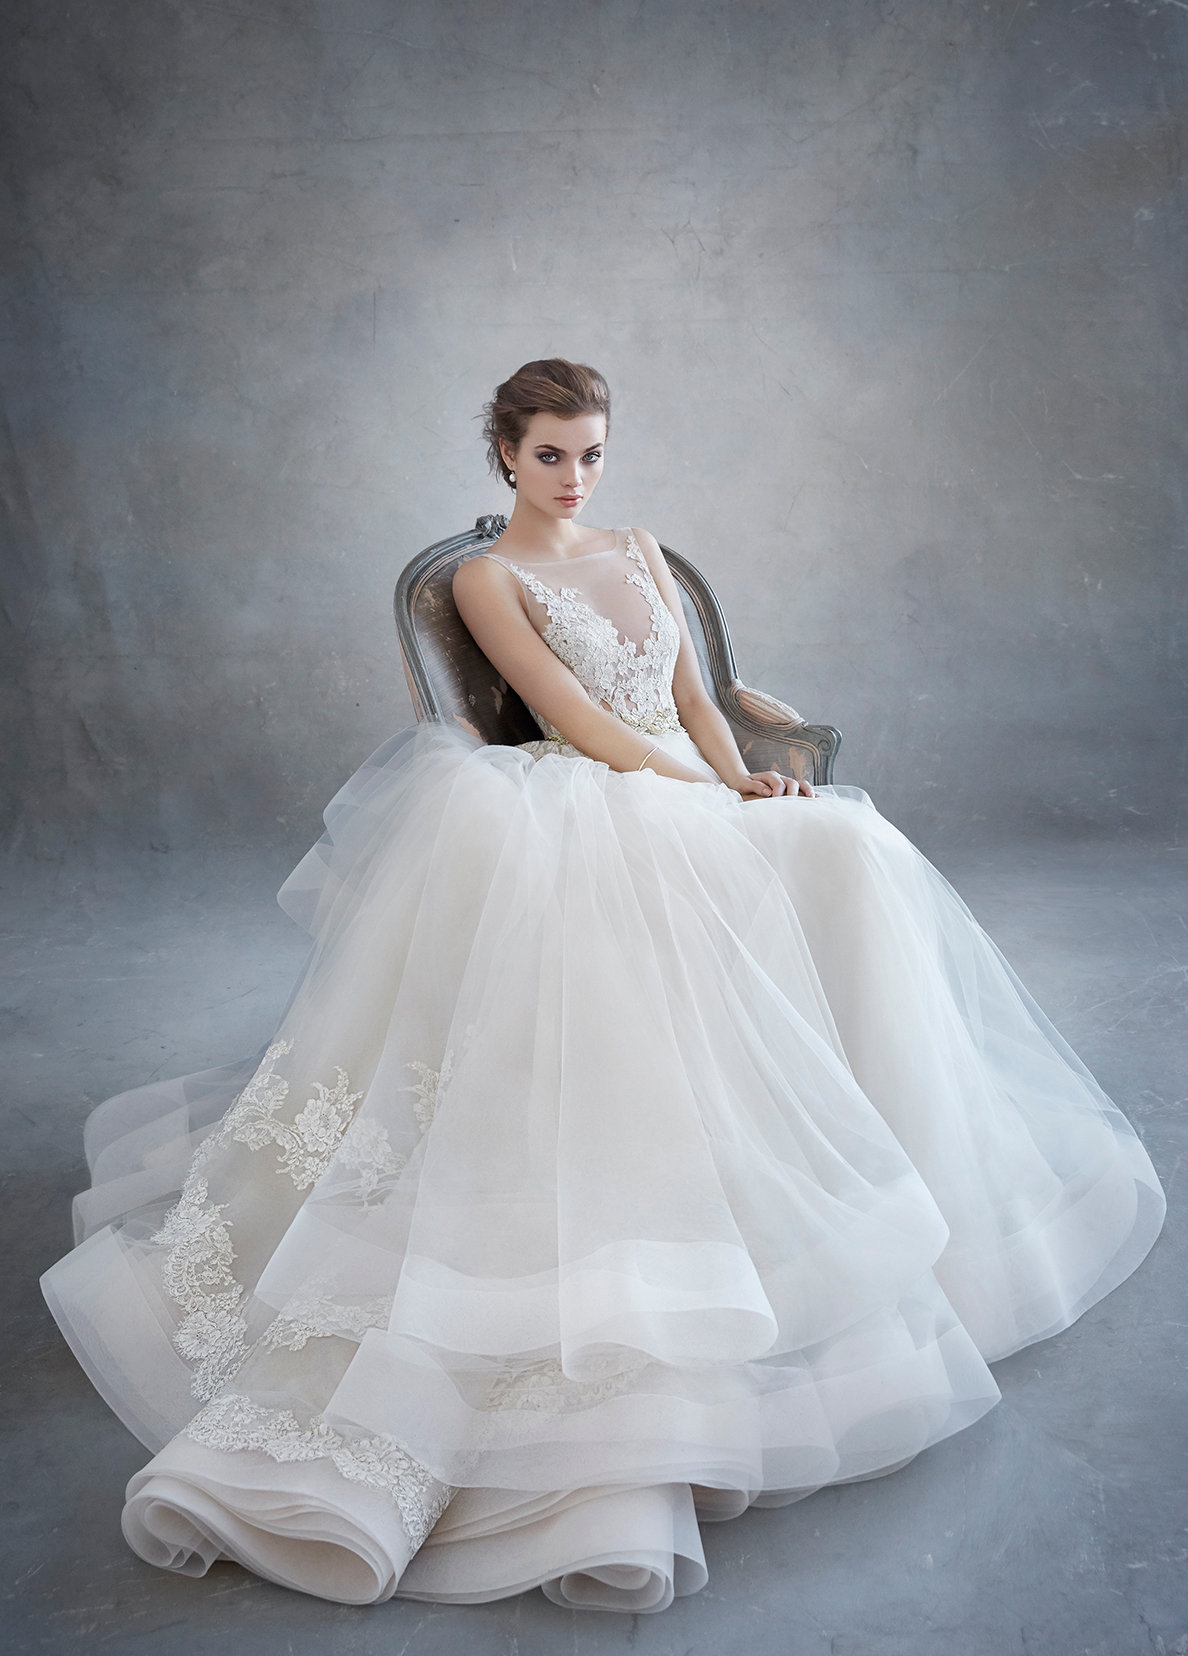 lazaro-bridal-tulle-ball-alencon-lace-metallic-beaded-natural-floral-horsehair-chapel-3607_x4